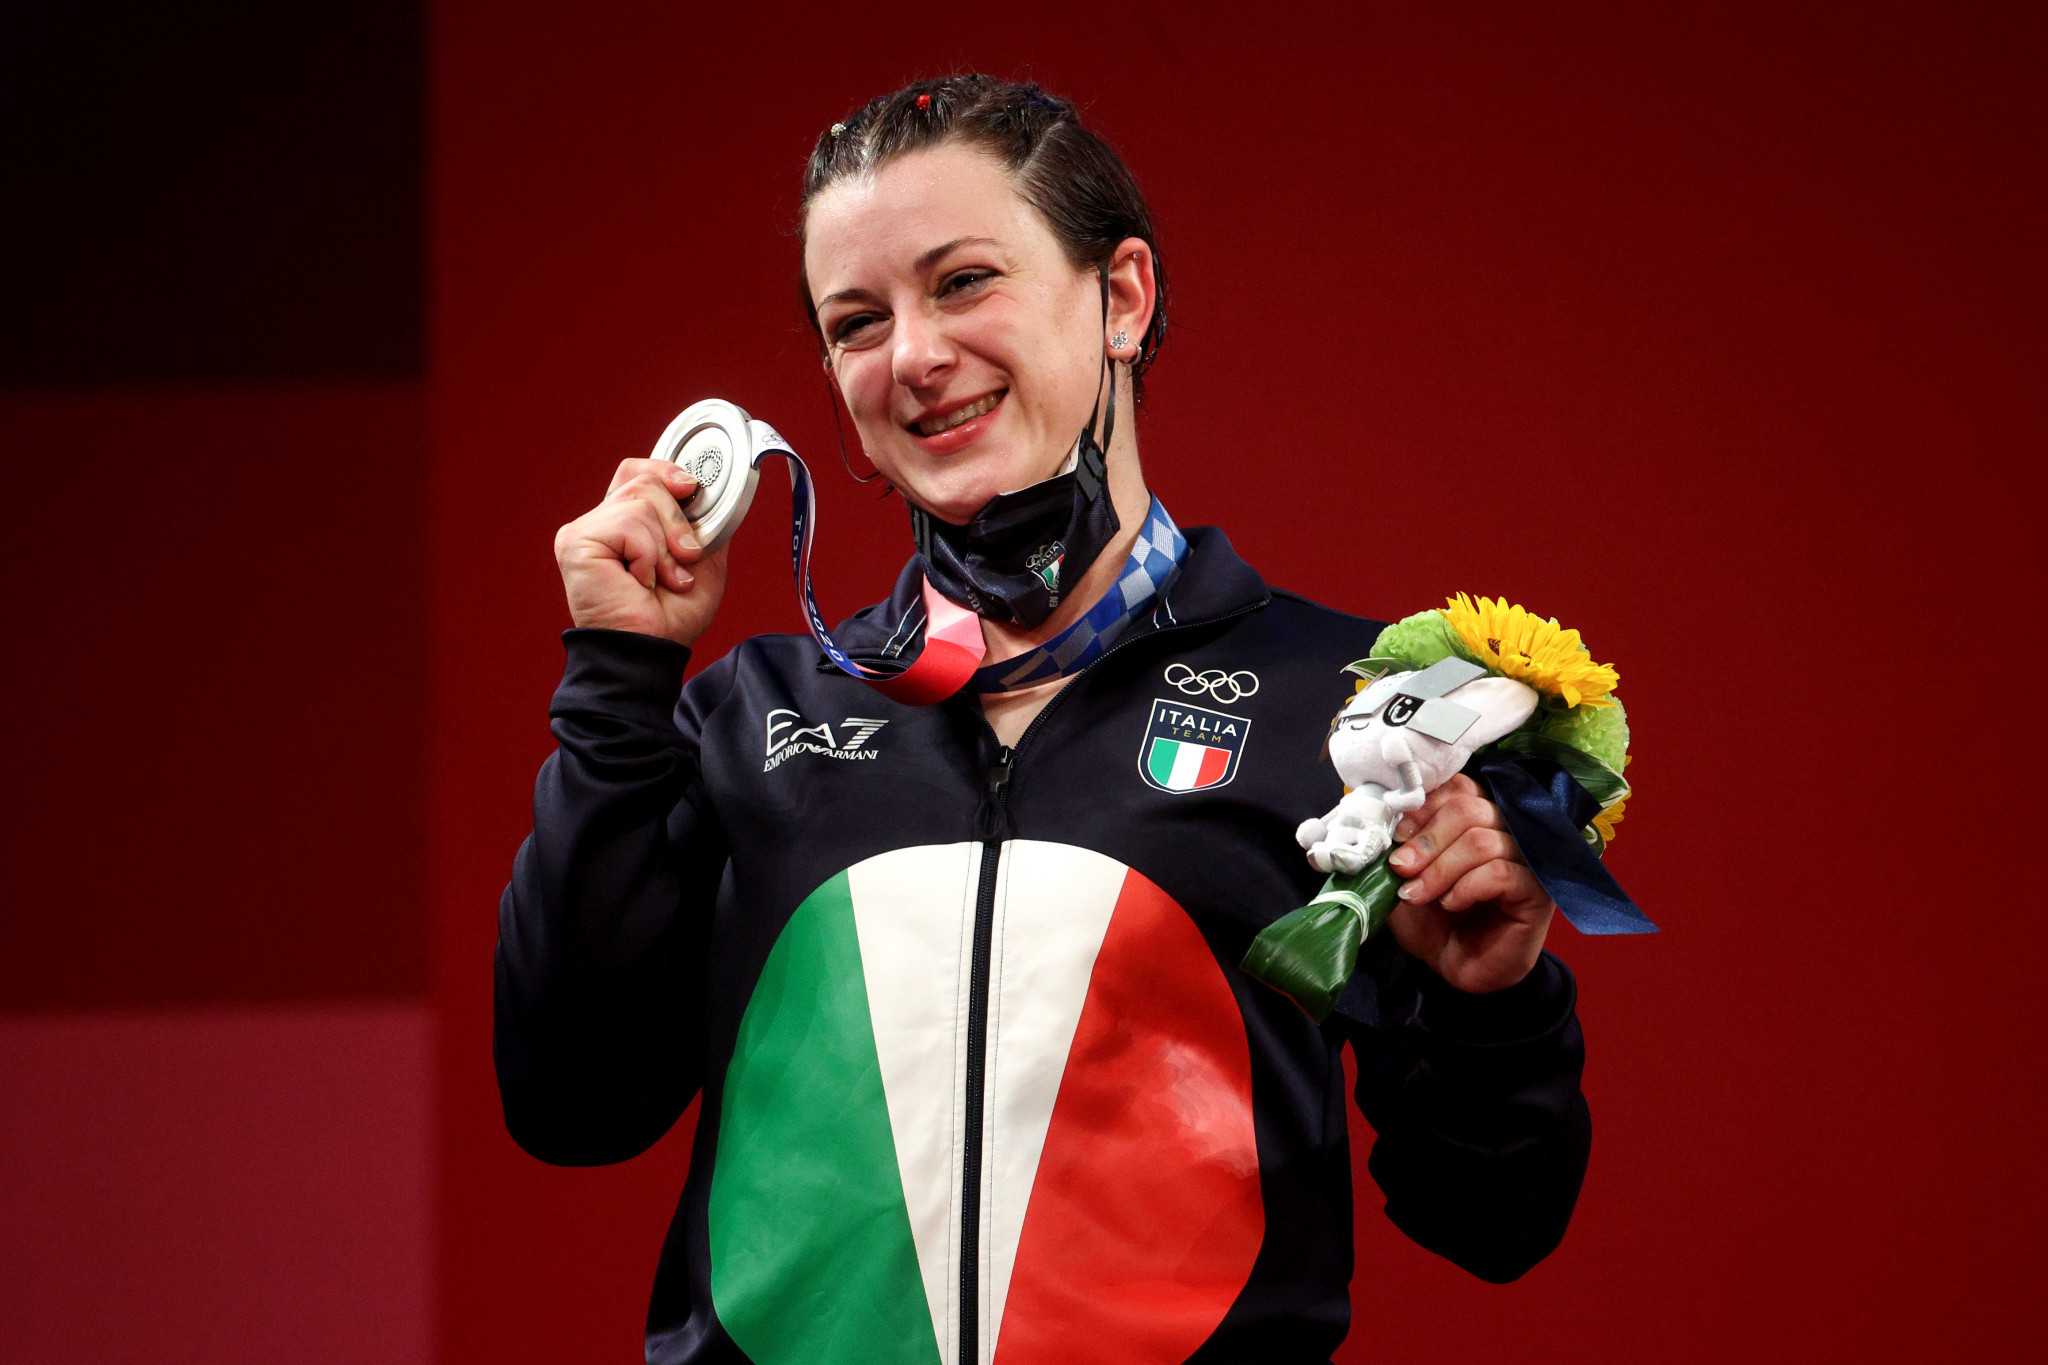 Georgia Portignon vince l'argento 64kg femminile a Tokyo 2020 © Getty Images